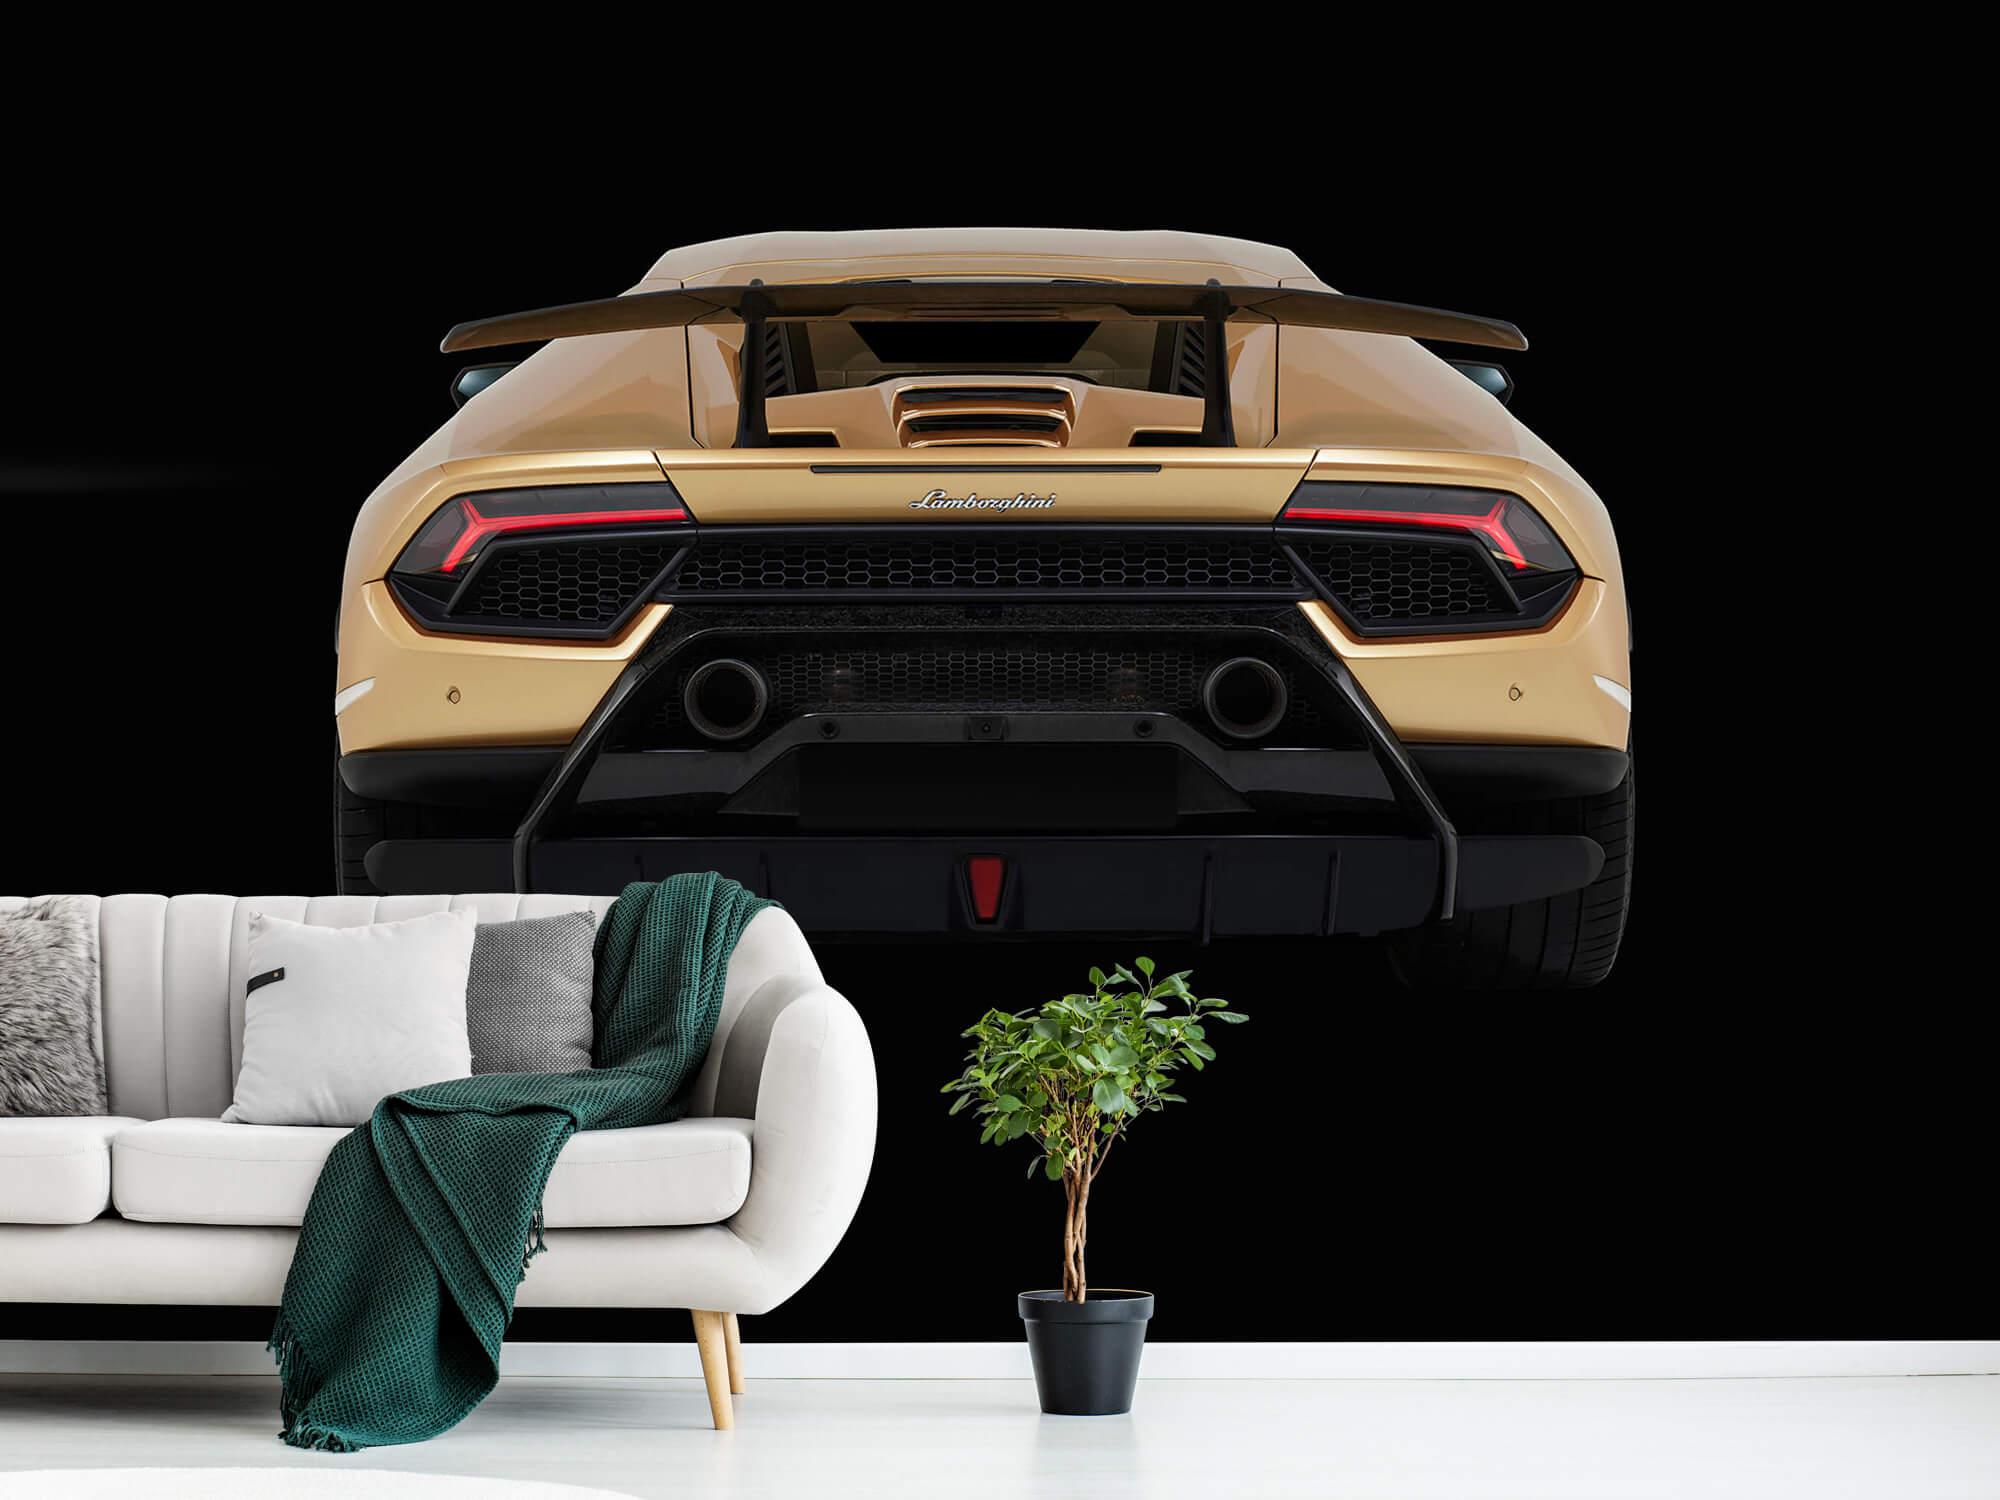 Wallpaper Lamborghini Huracán - Rear view, black 12